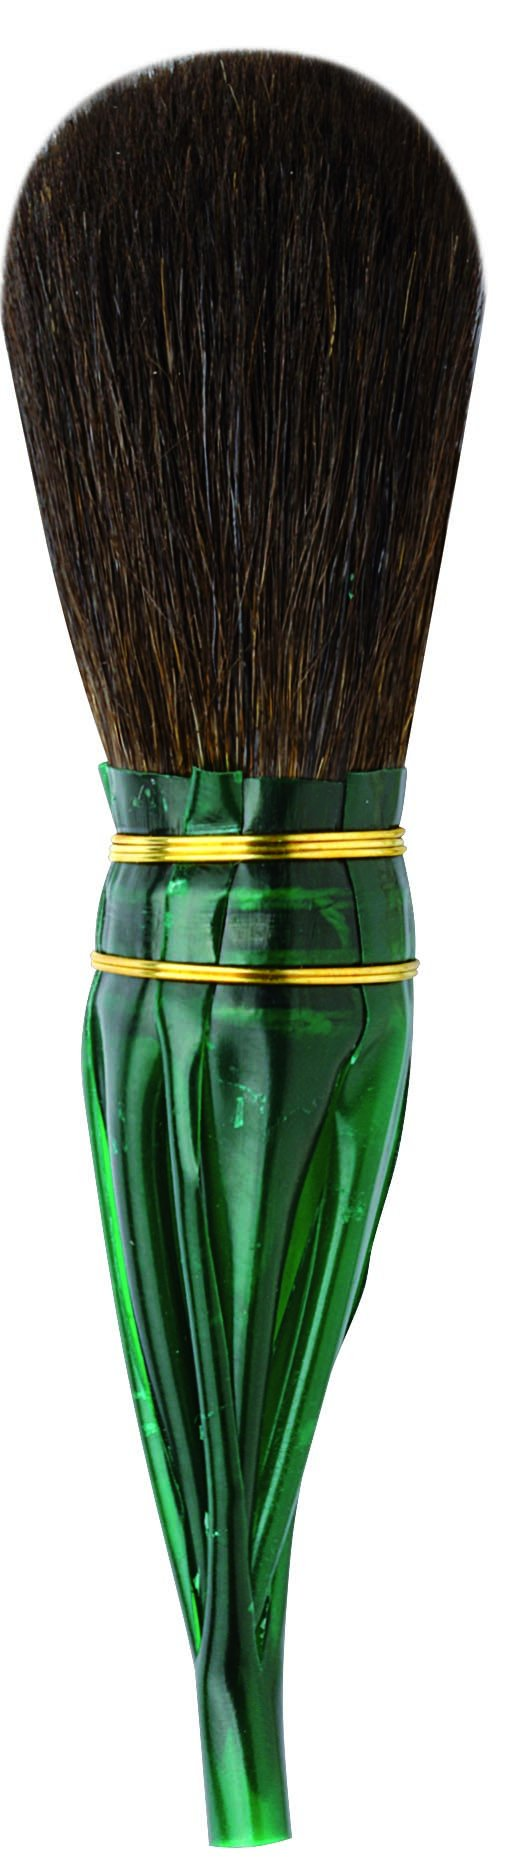 da Vinci Gilding Series 710 Double Quill Gilder Mop, Oval Blue Squirrel Hair, Size 20 by da Vinci Brushes